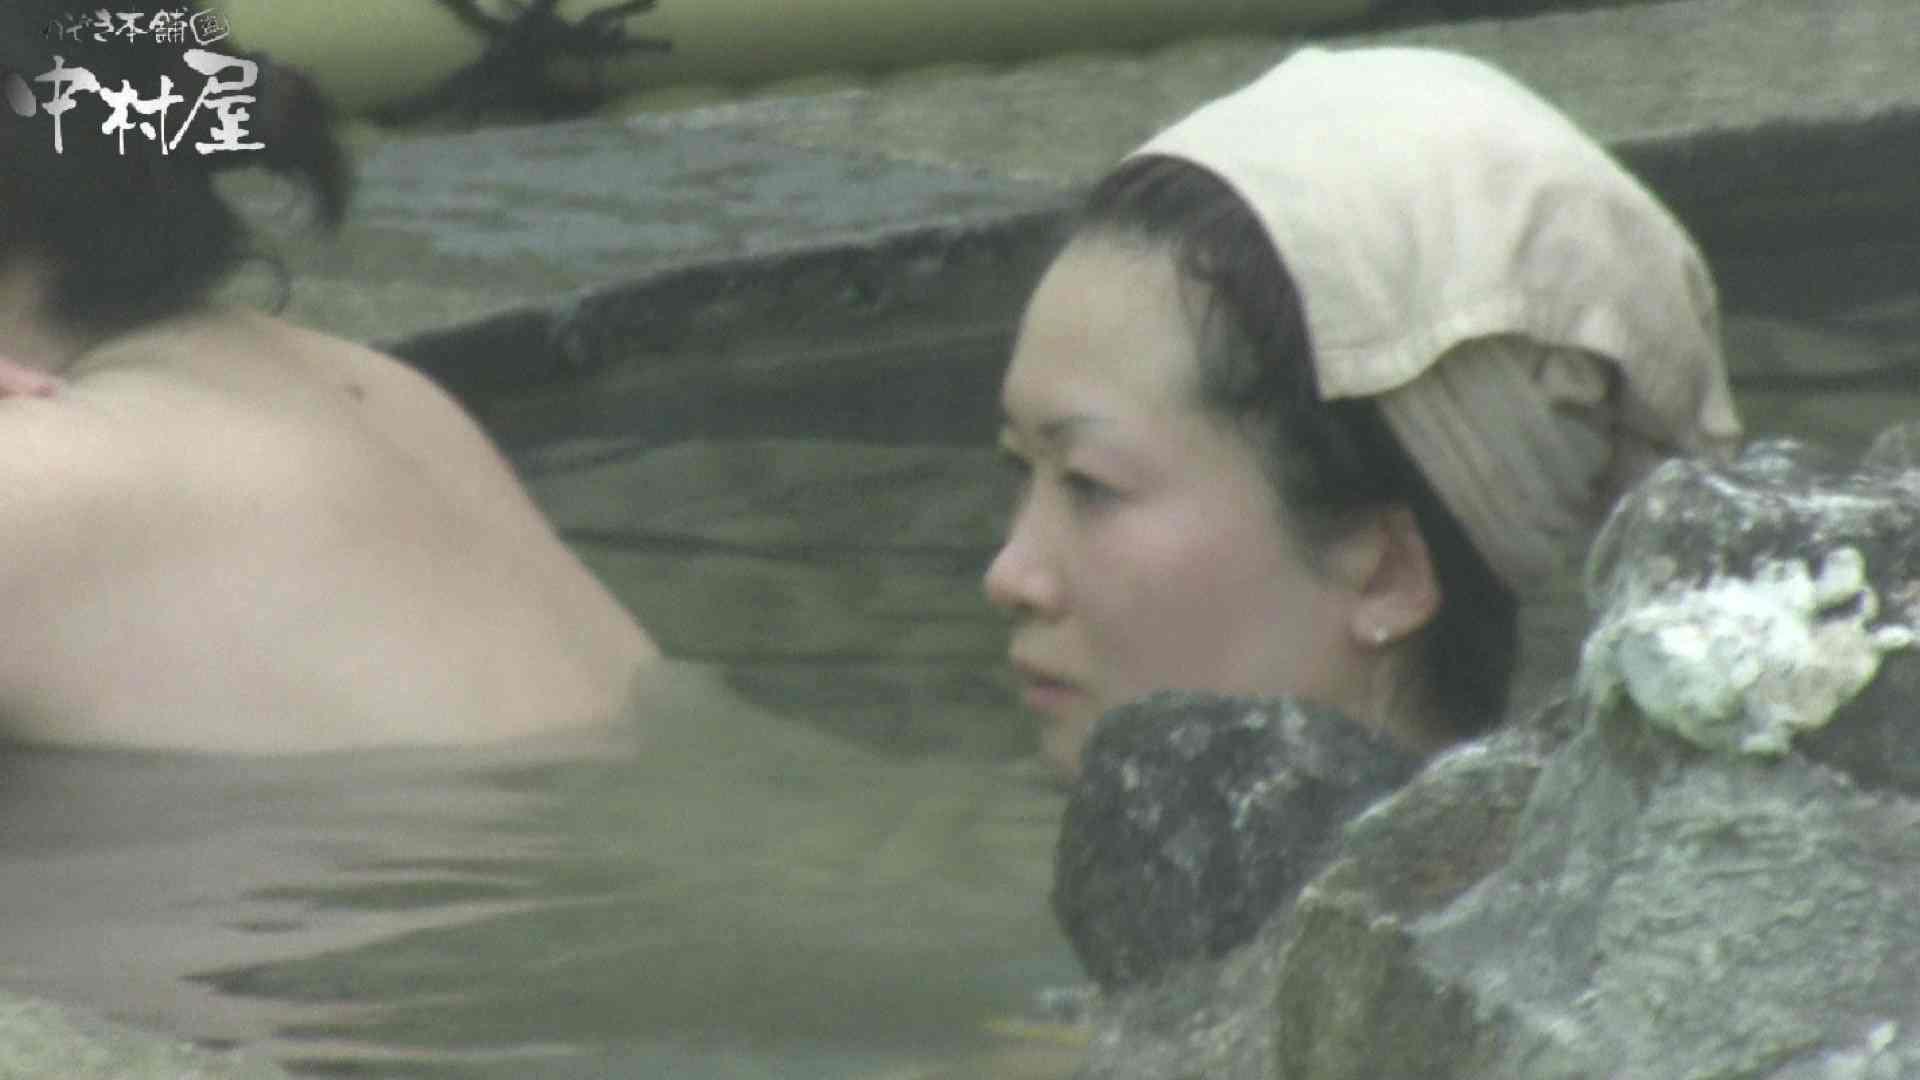 Aquaな露天風呂Vol.906 露天風呂編  86PIX 72